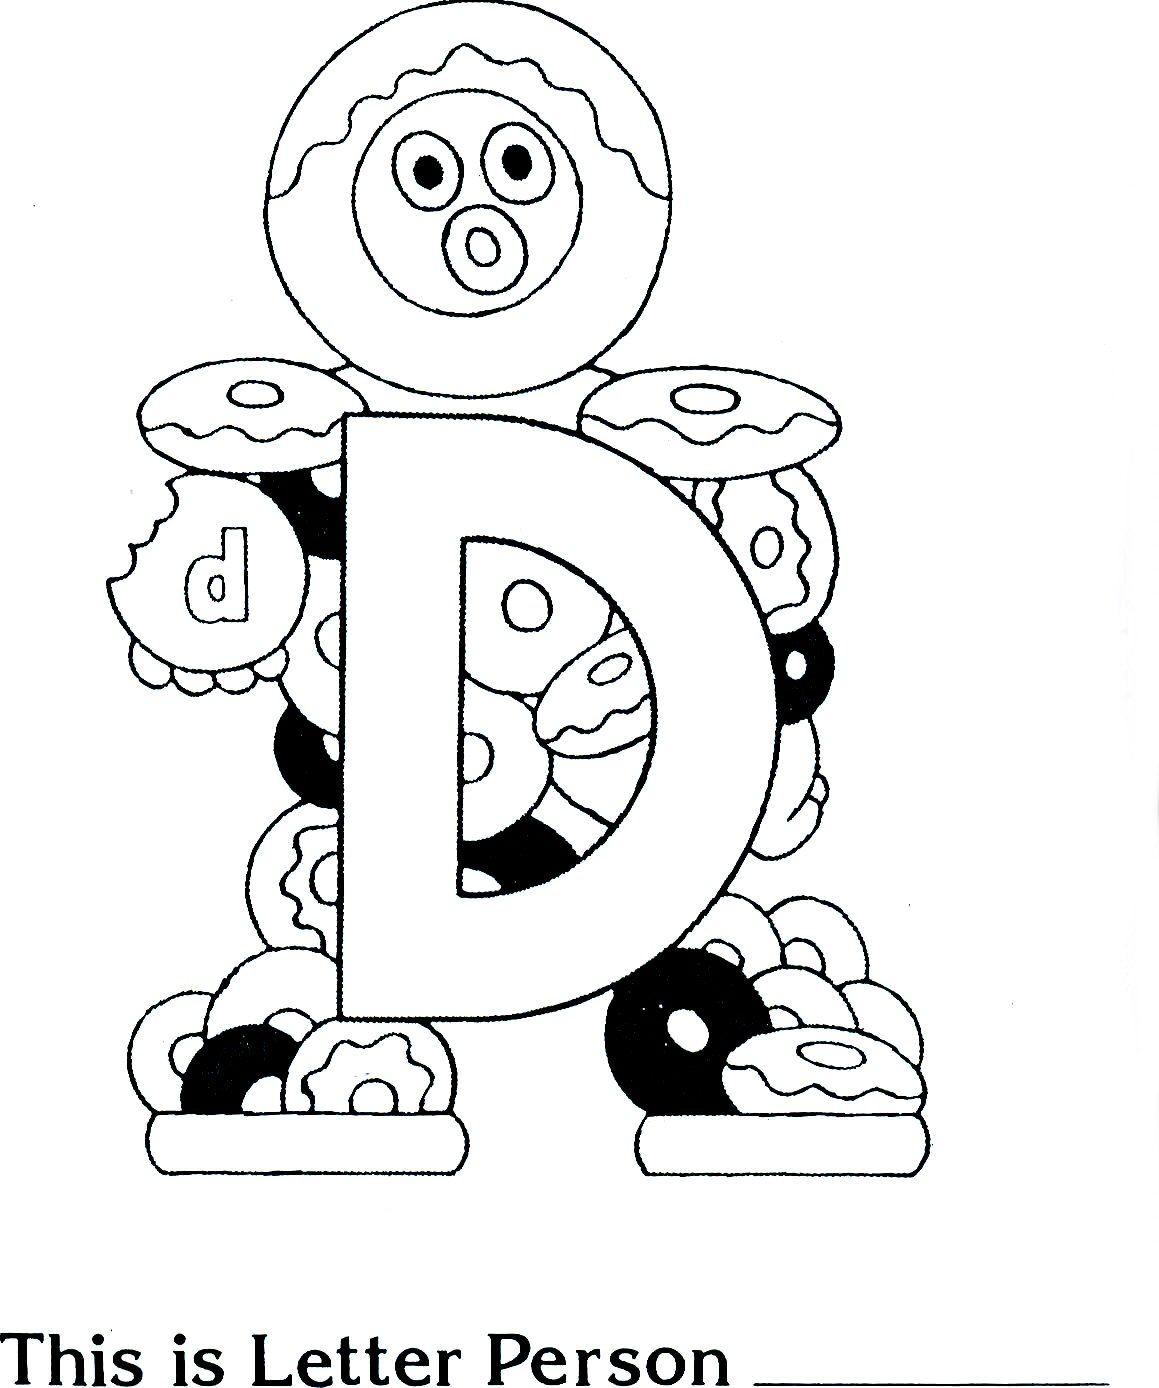 2lpd Jpg 1159 1388 Letter People Preschool Letters Alphabet Coloring Pages